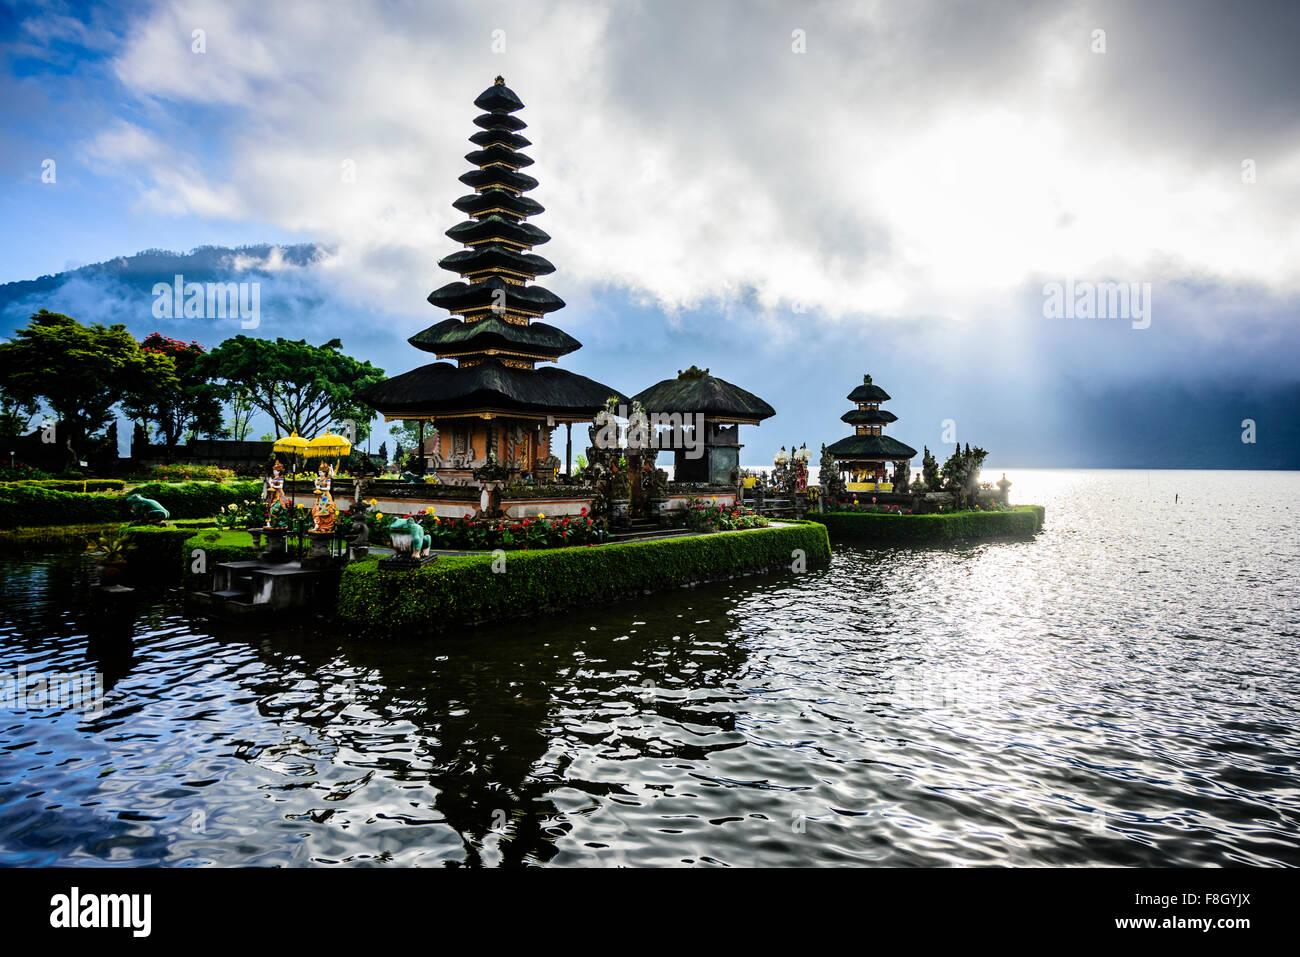 Pagoda floating on water, Baturiti, Bali, Indonesia - Stock Image